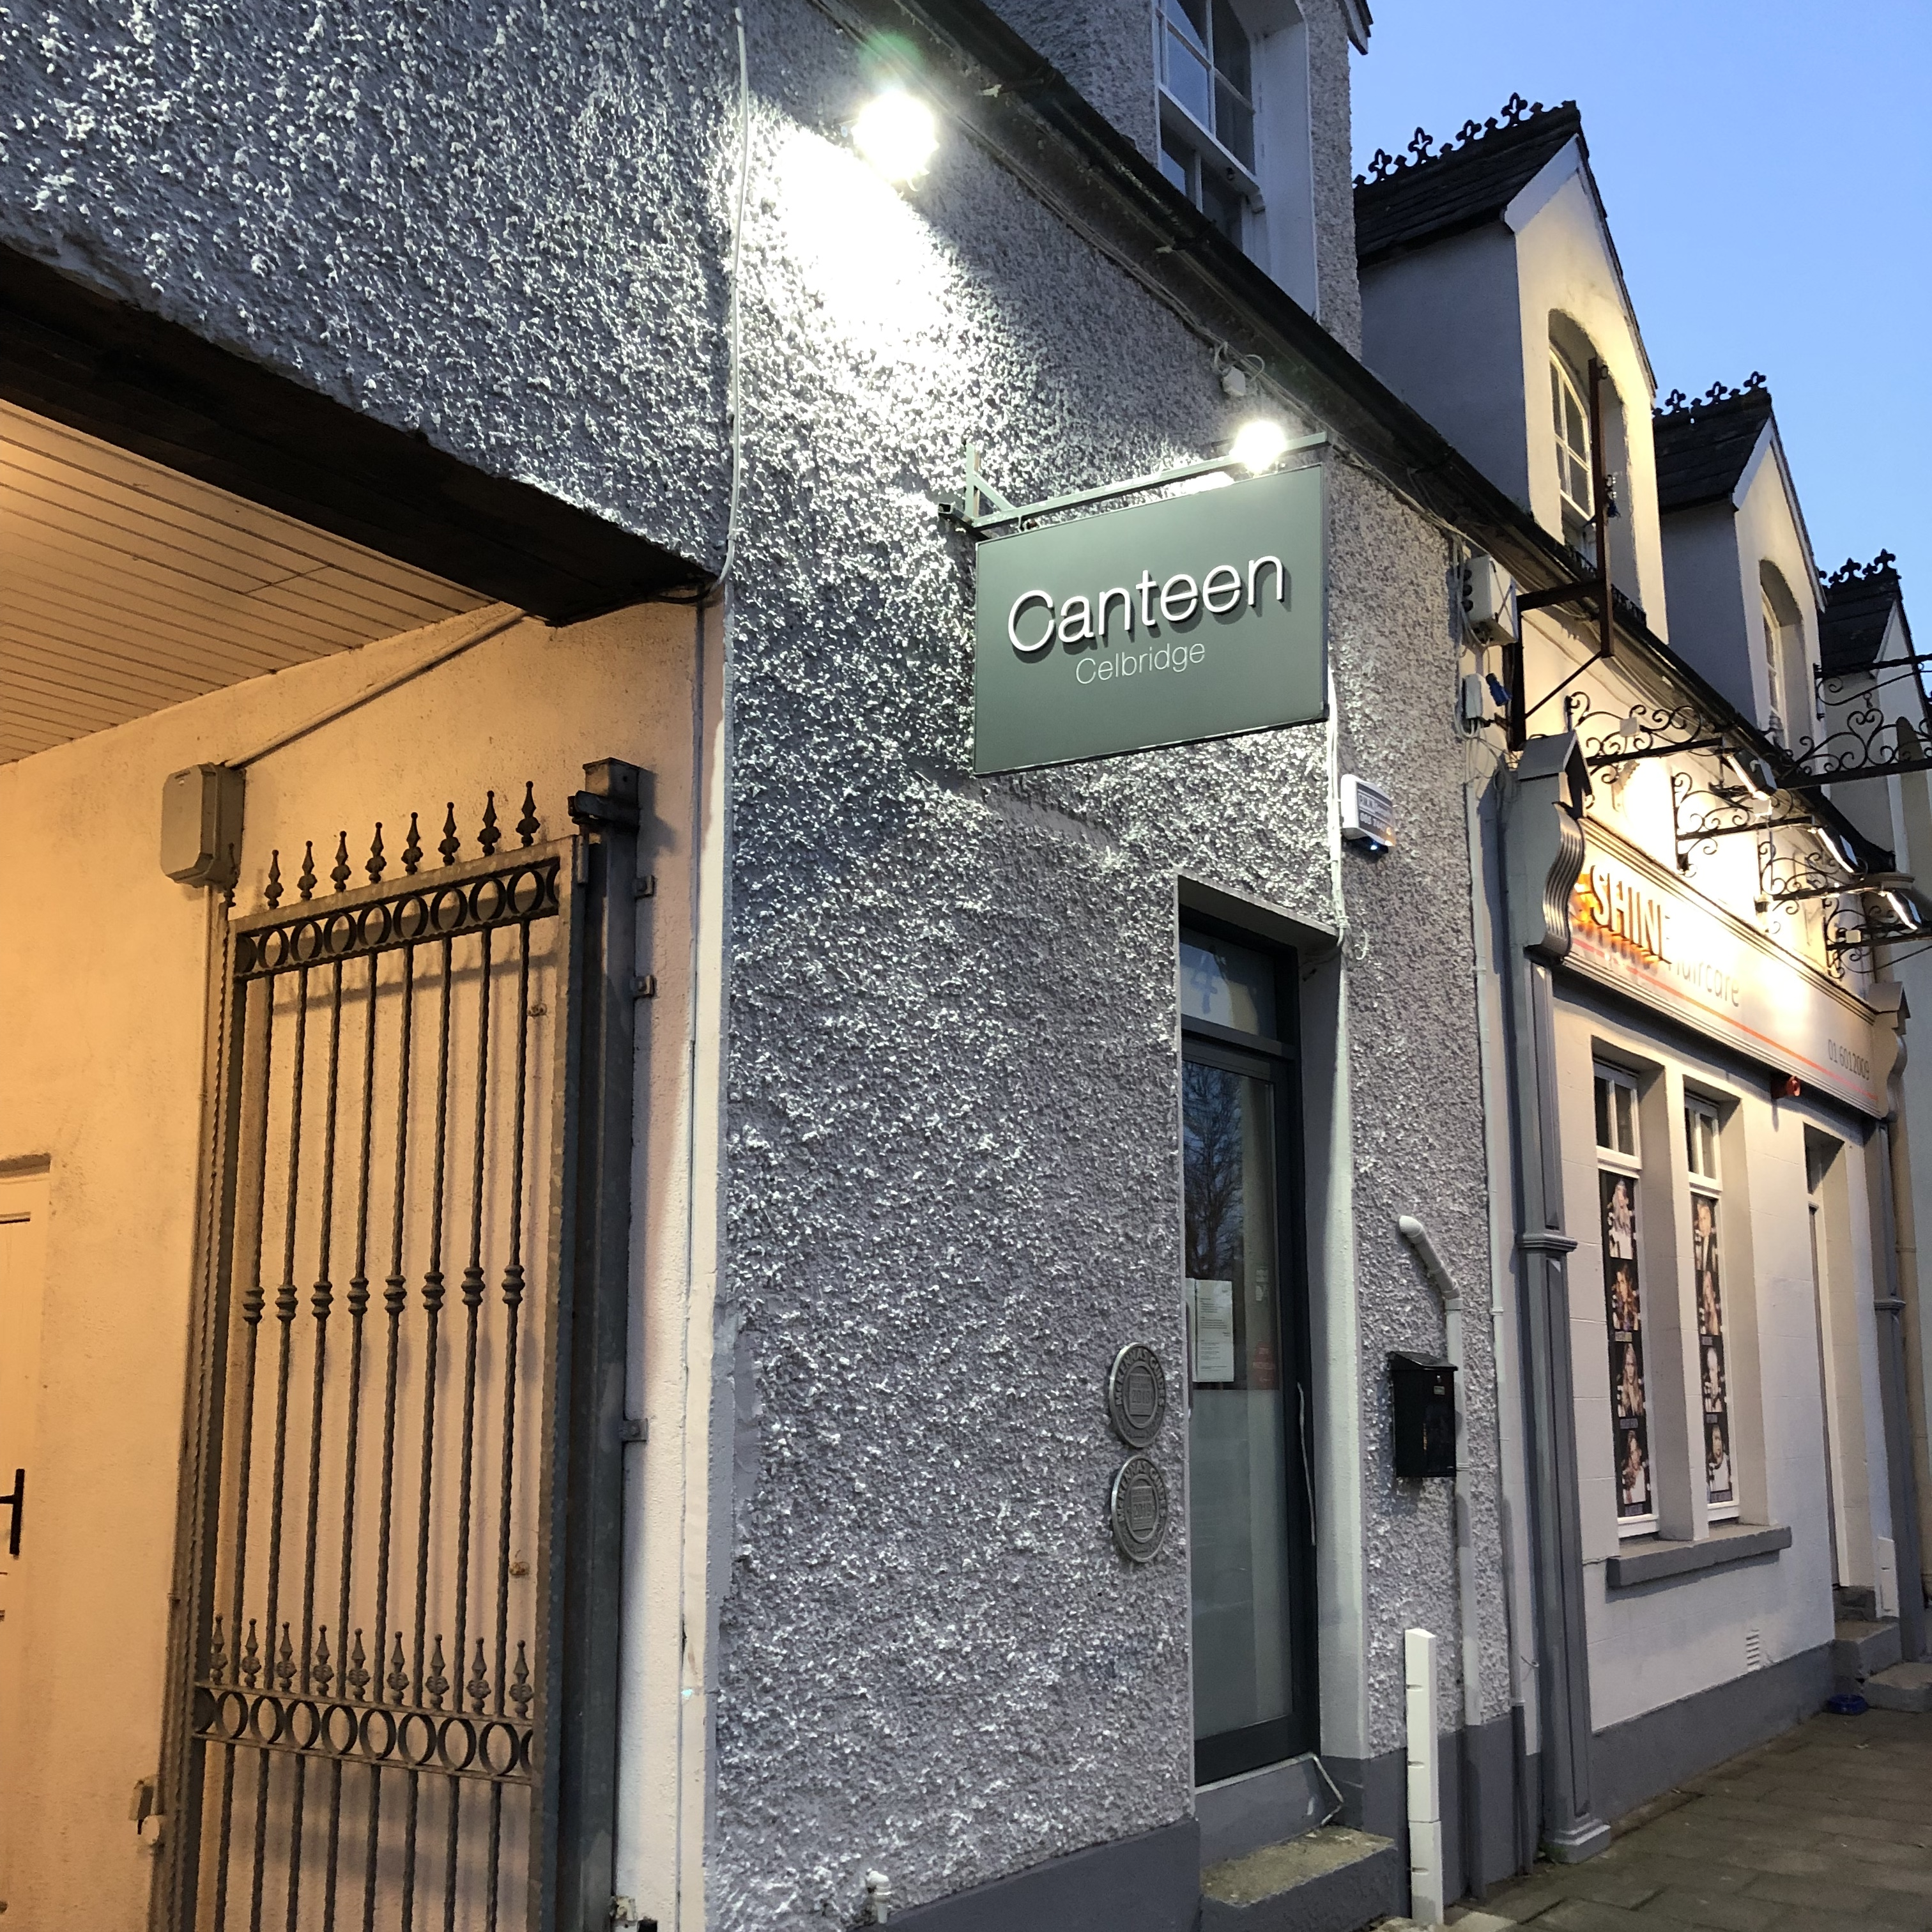 Canteen Restaurant, Celbridge, Kildare